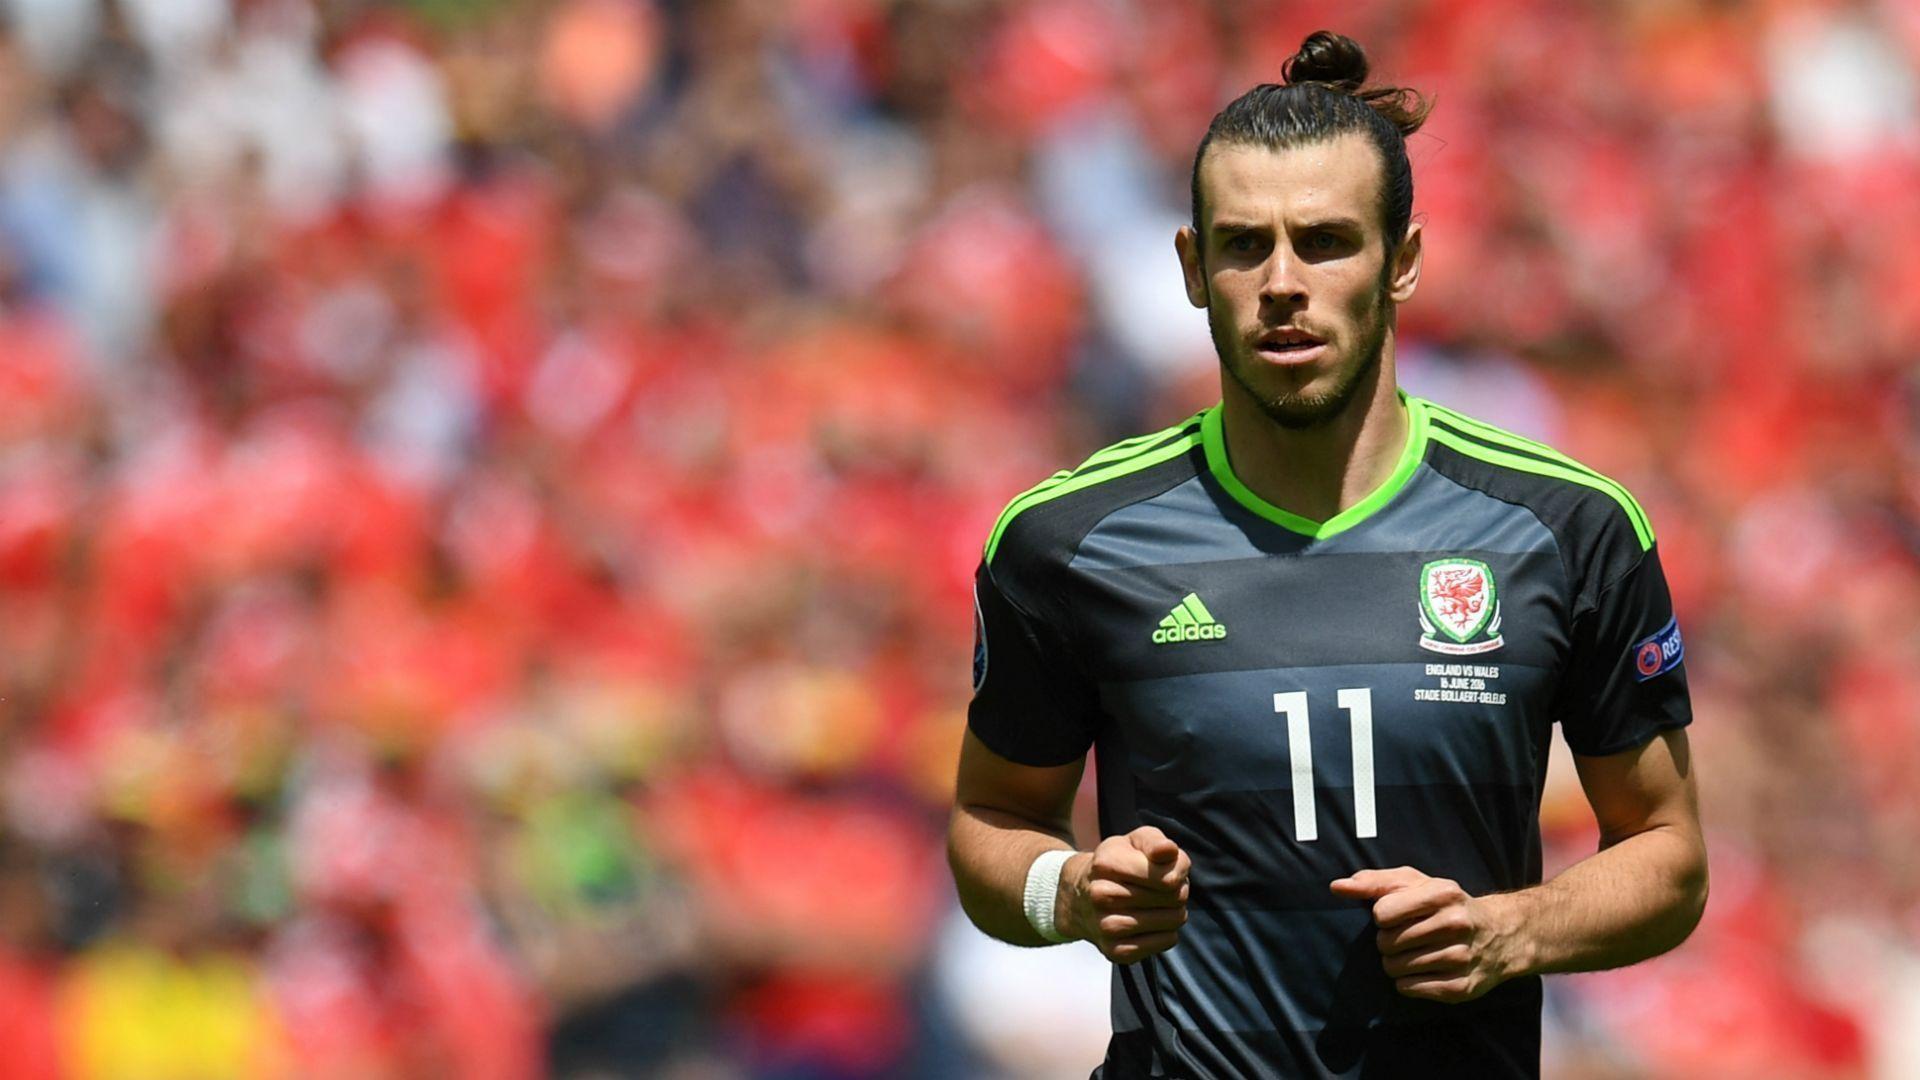 Gareth Bale HD Image – New HD Images